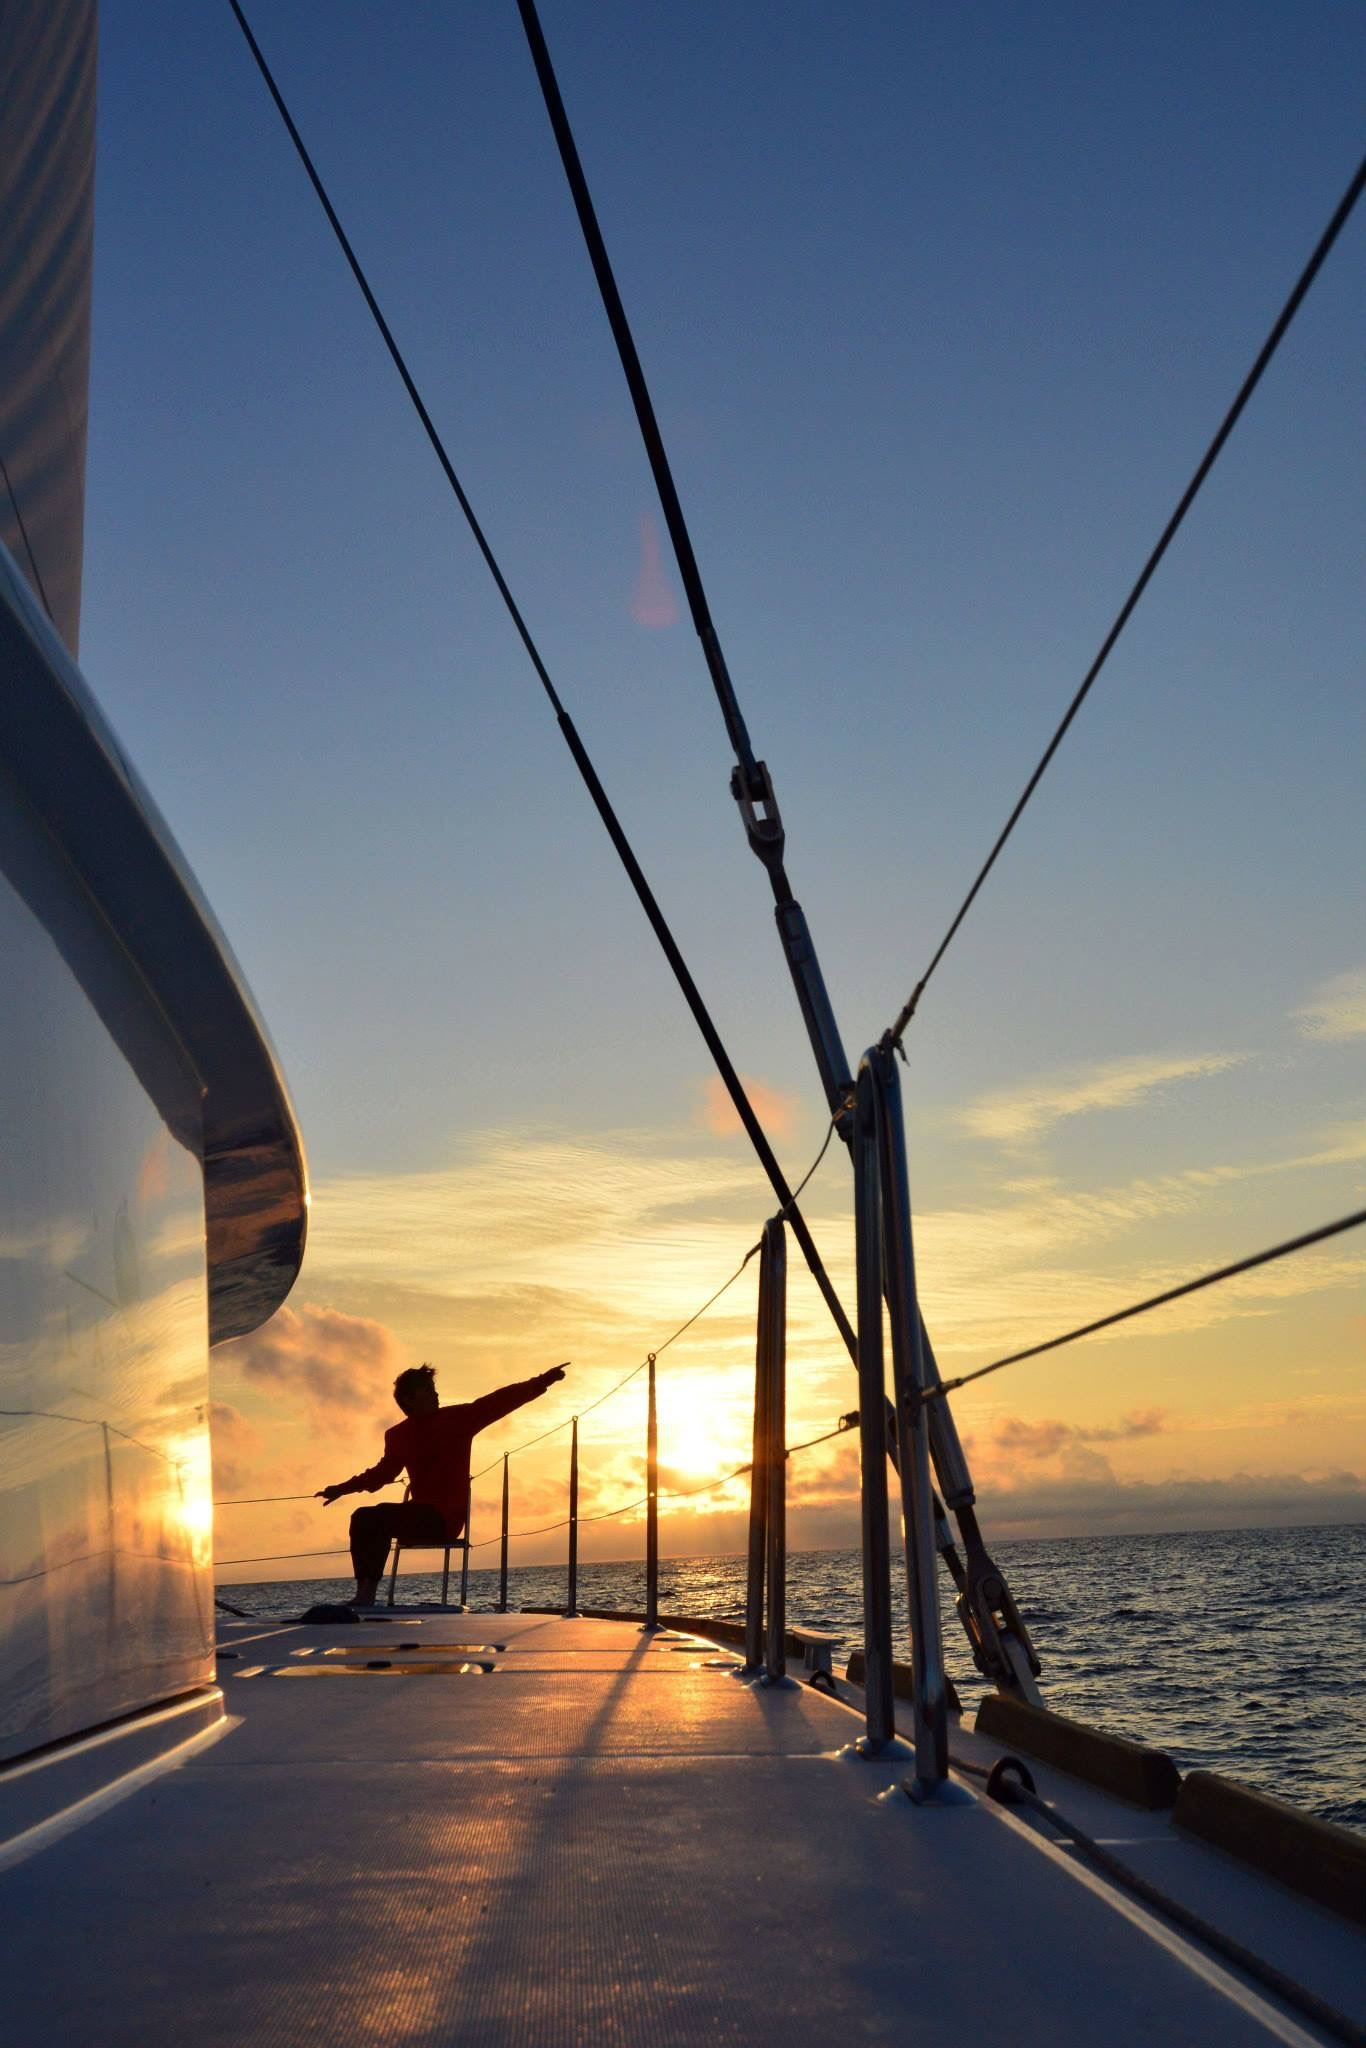 Midnightsun sailing - Luxury catamaran Arctic Princess - Arctic Cruise in Norway